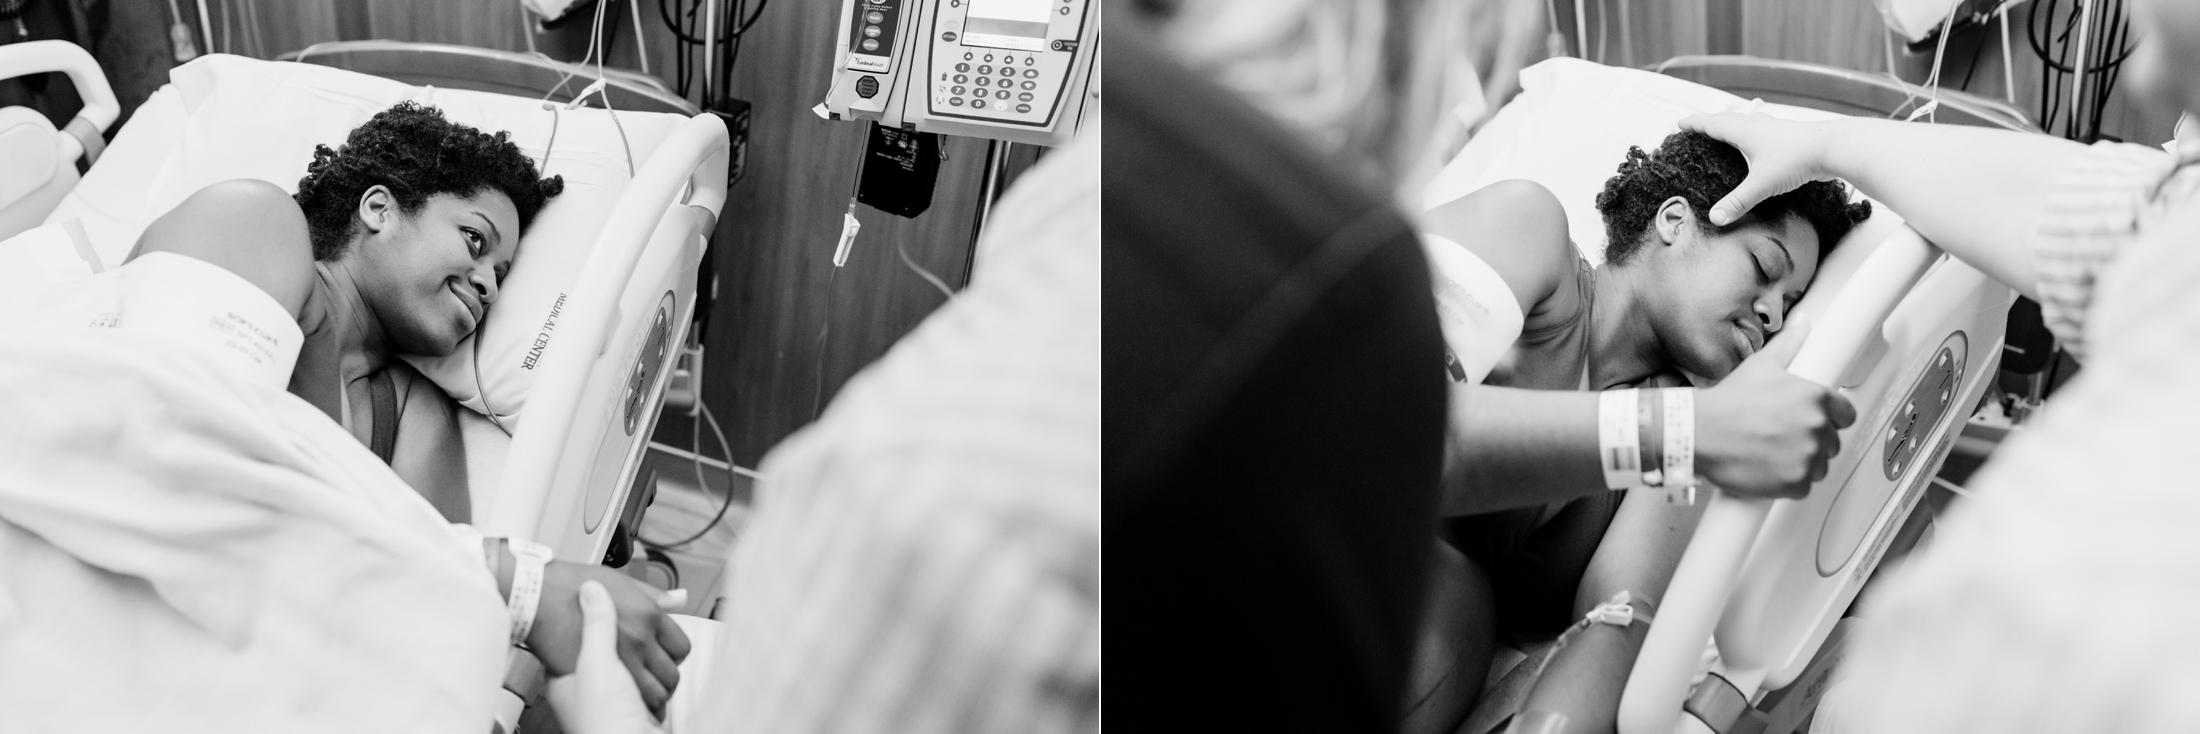 austin-hospital-birth-photography